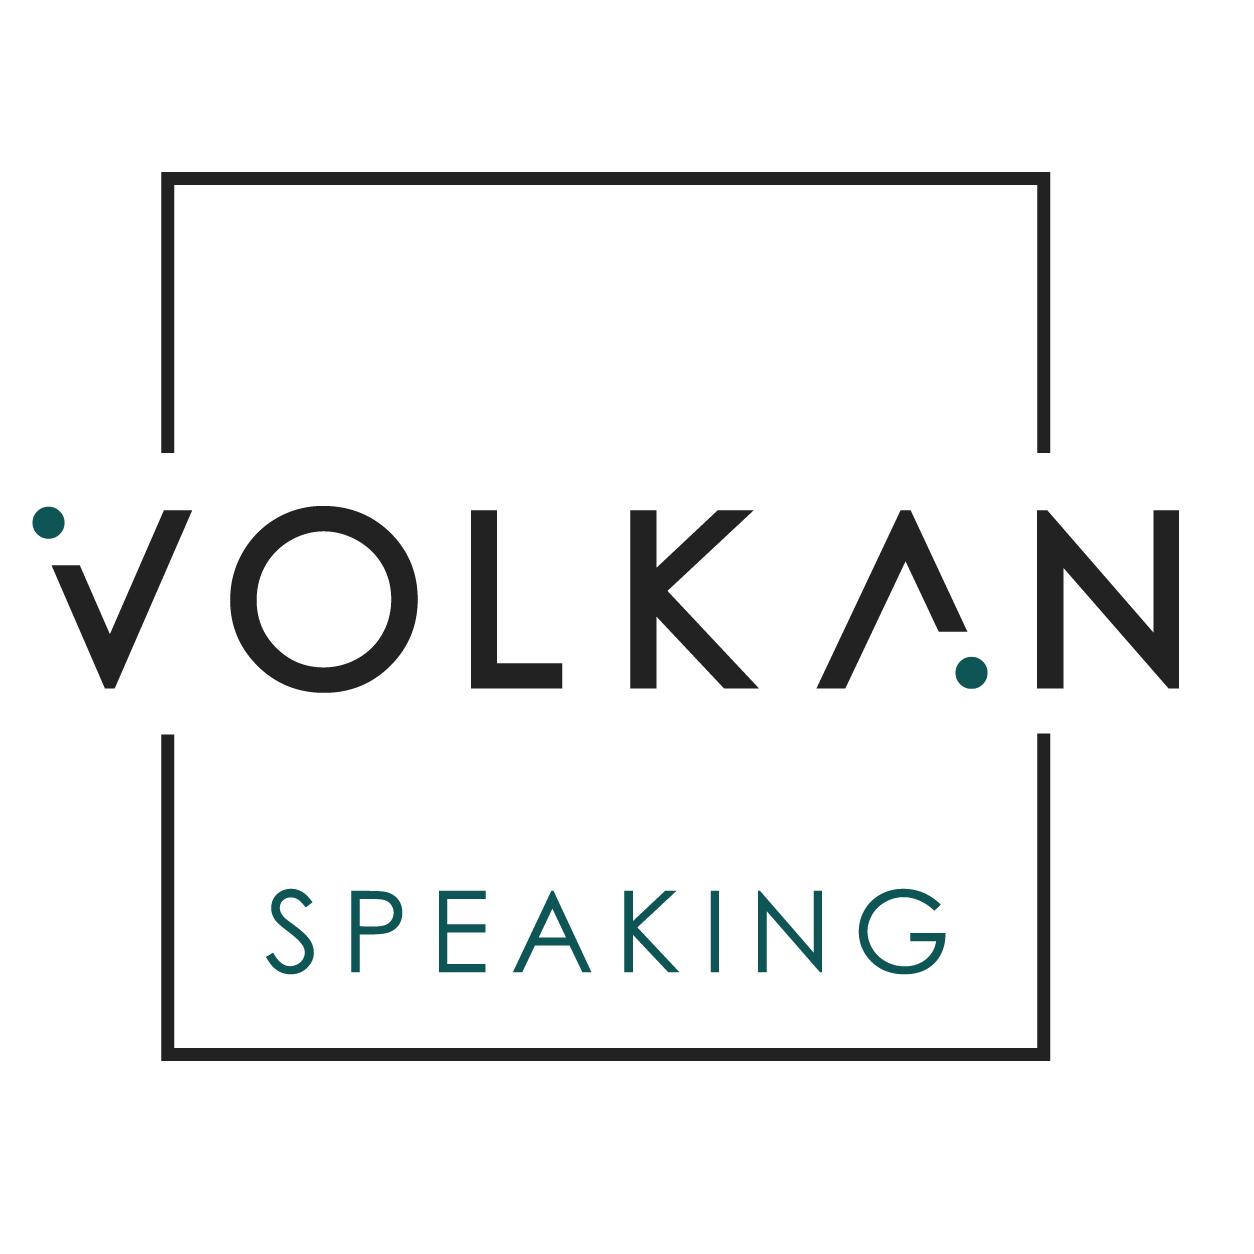 klein_01- Volkan Main Logo - White Background.jpg